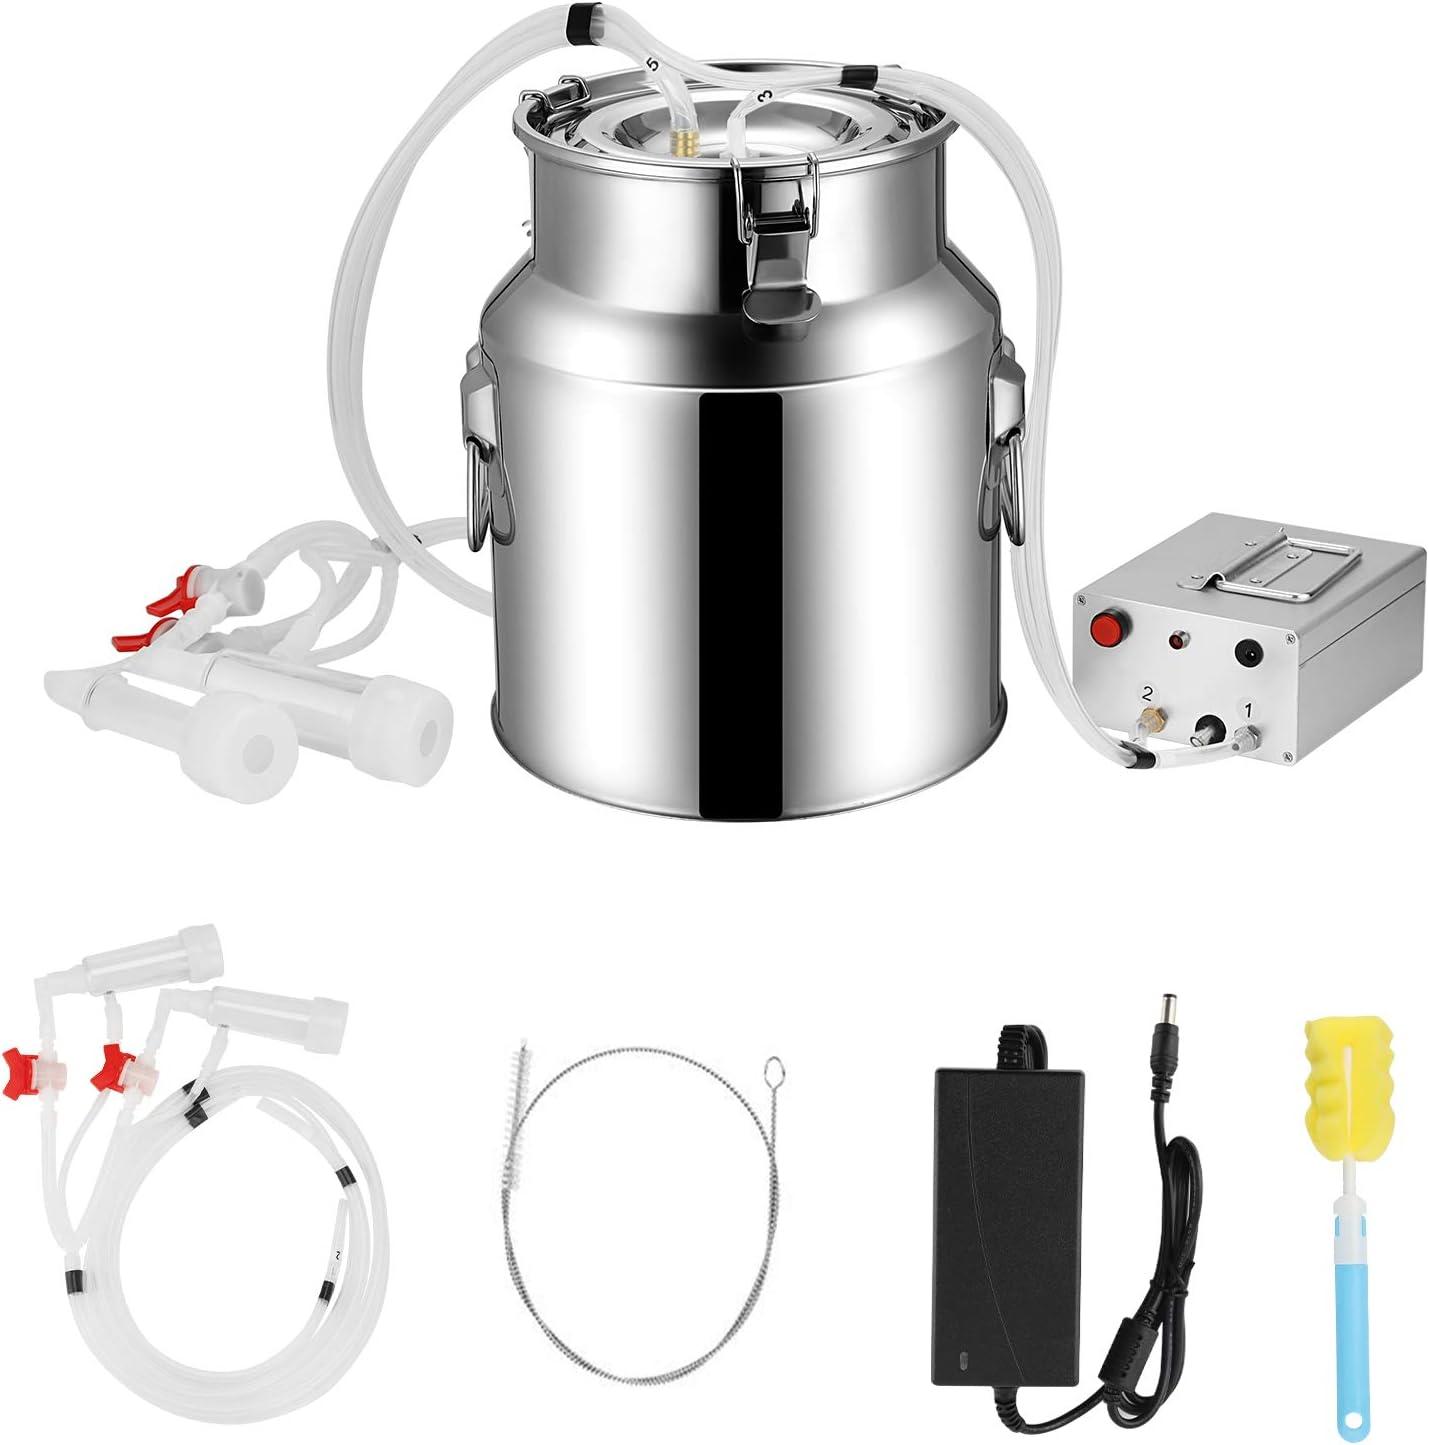 SEAAN 14L Cow Goat Milking Machine Electric,Portable Electric Milking Machine,Milk Machine Pulsation Vacuum Pump Milker Adjustable Vacuum Pump